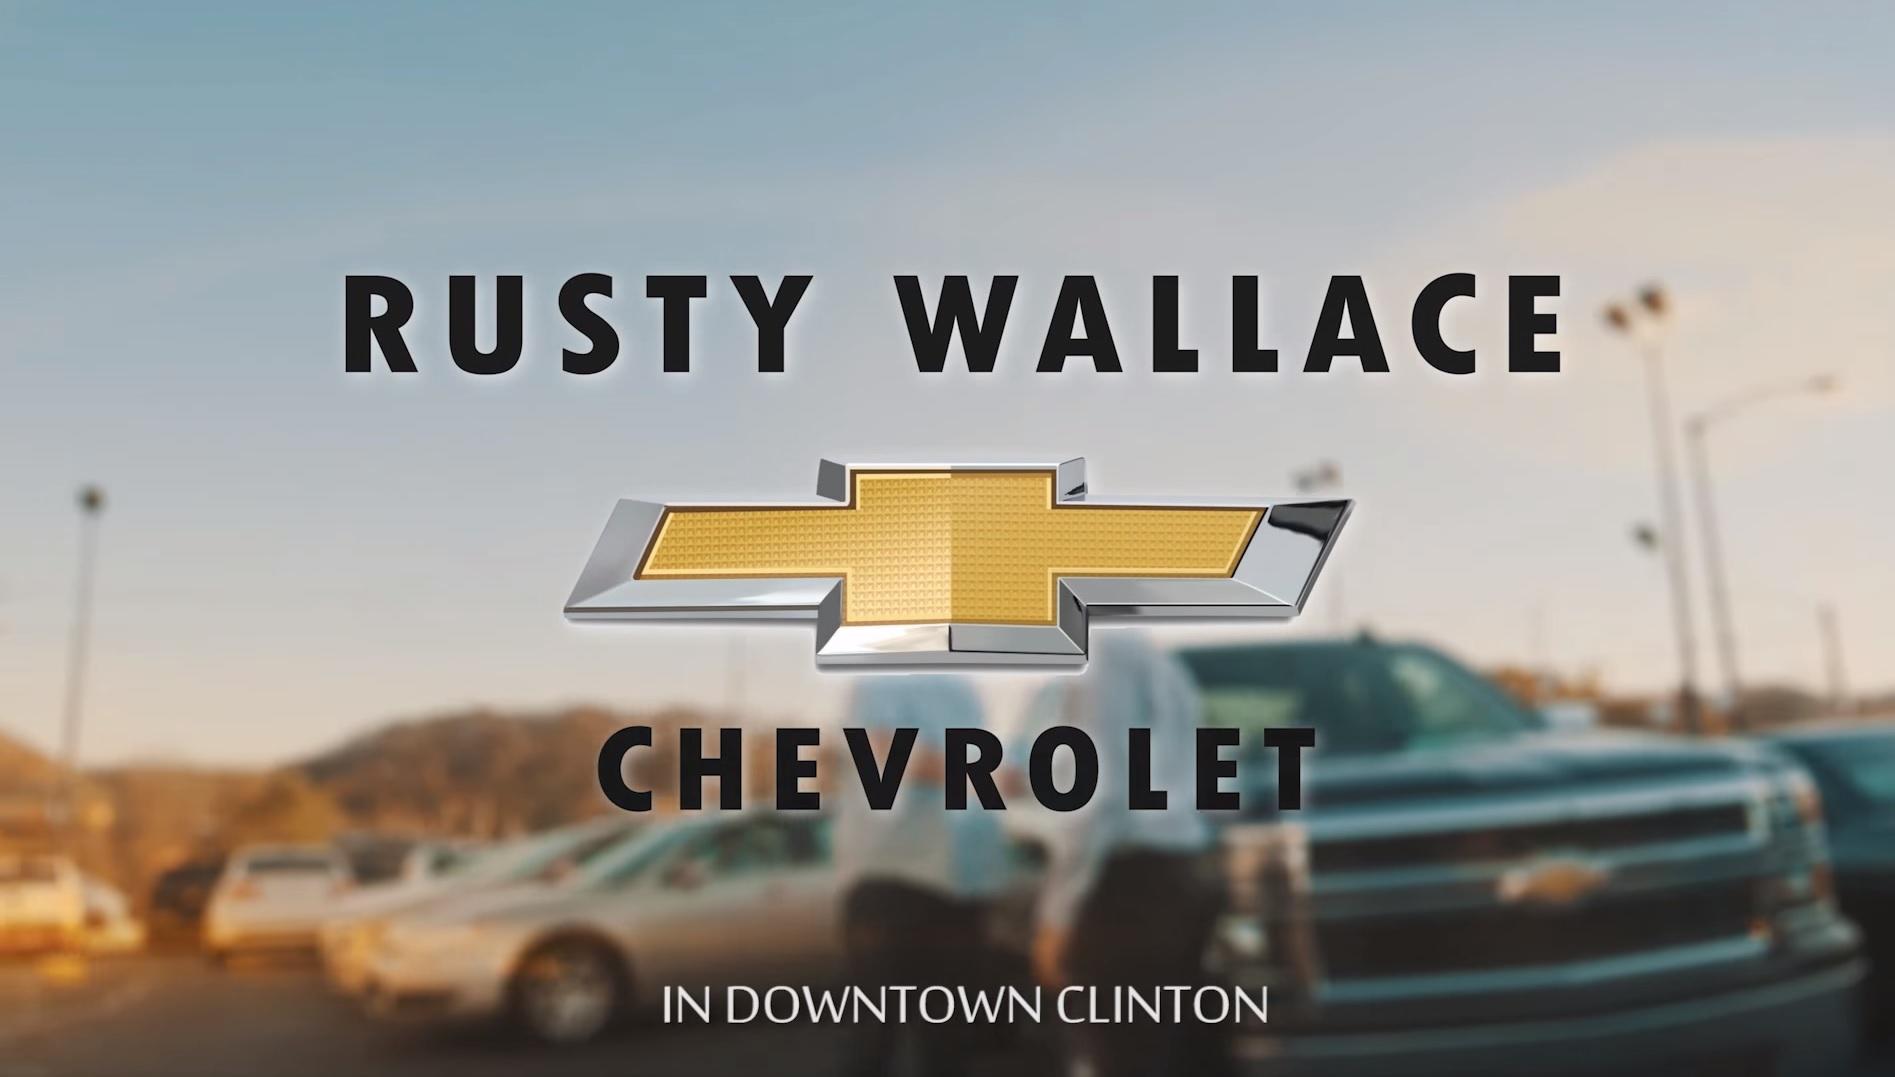 Rusty Wallace Chevrolet